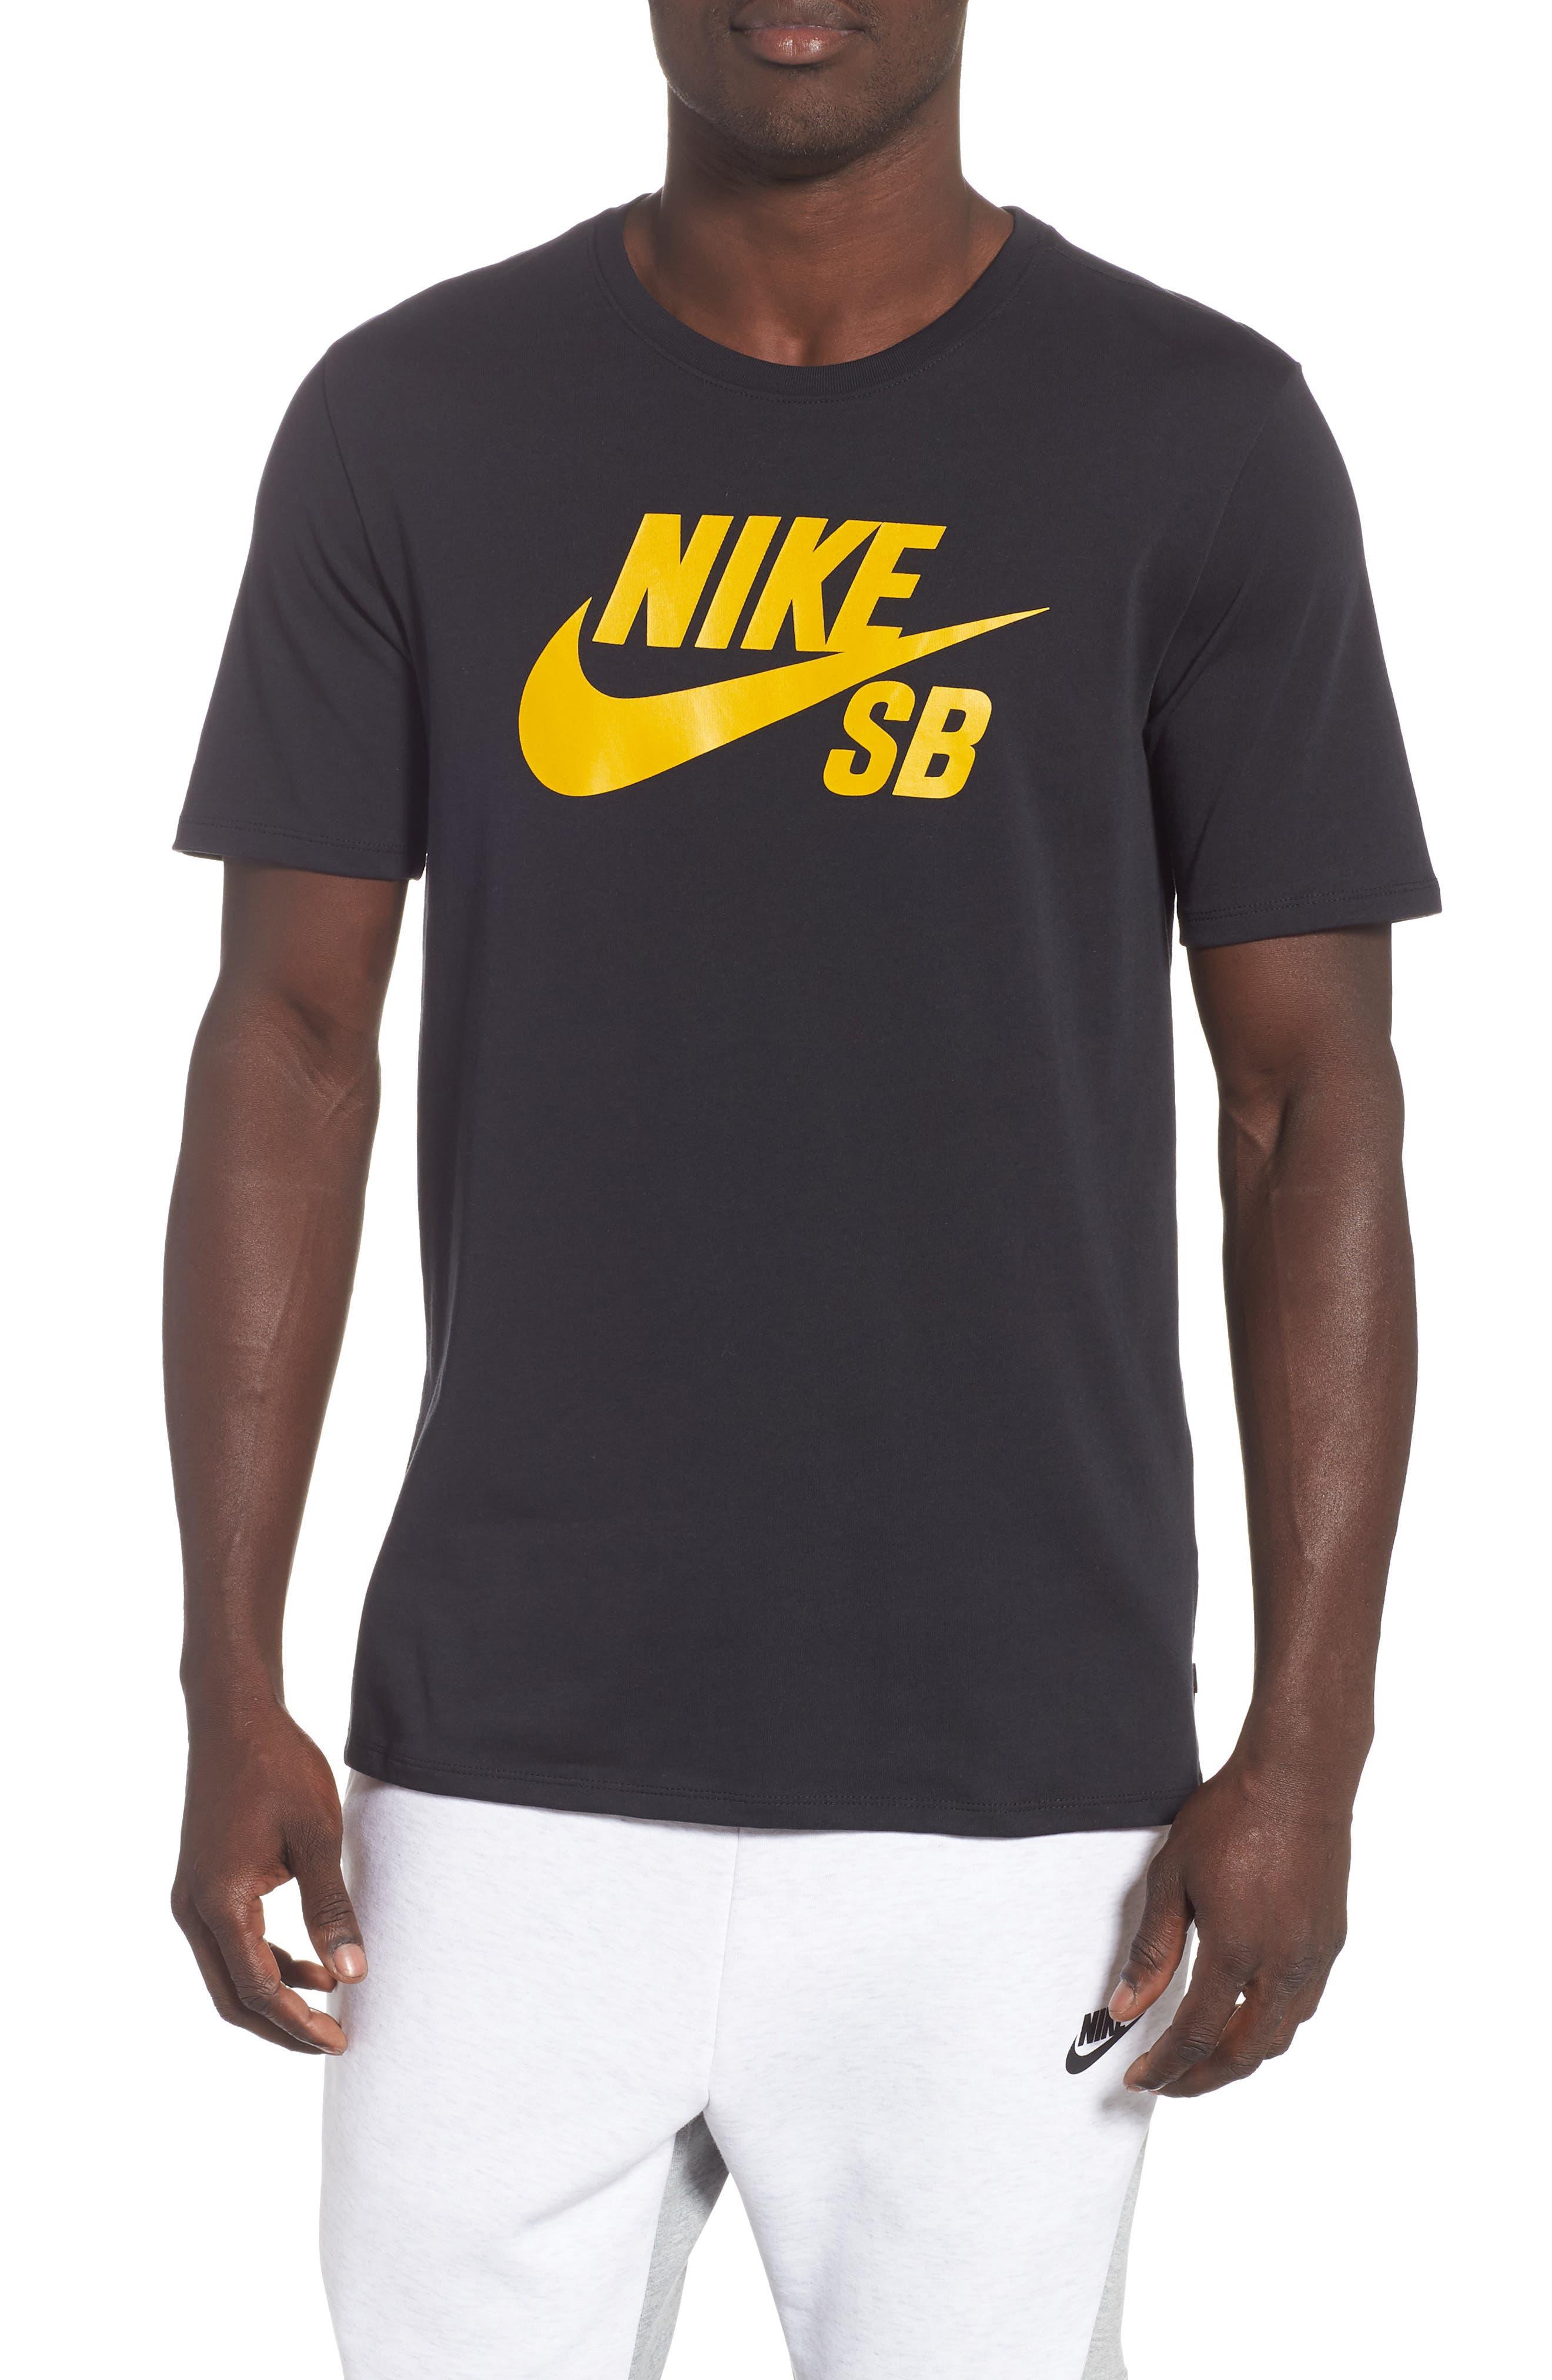 Nike 'SB Logo' T-Shirt,                             Main thumbnail 1, color,                             BLACK/ YELLOW/ OCHRE